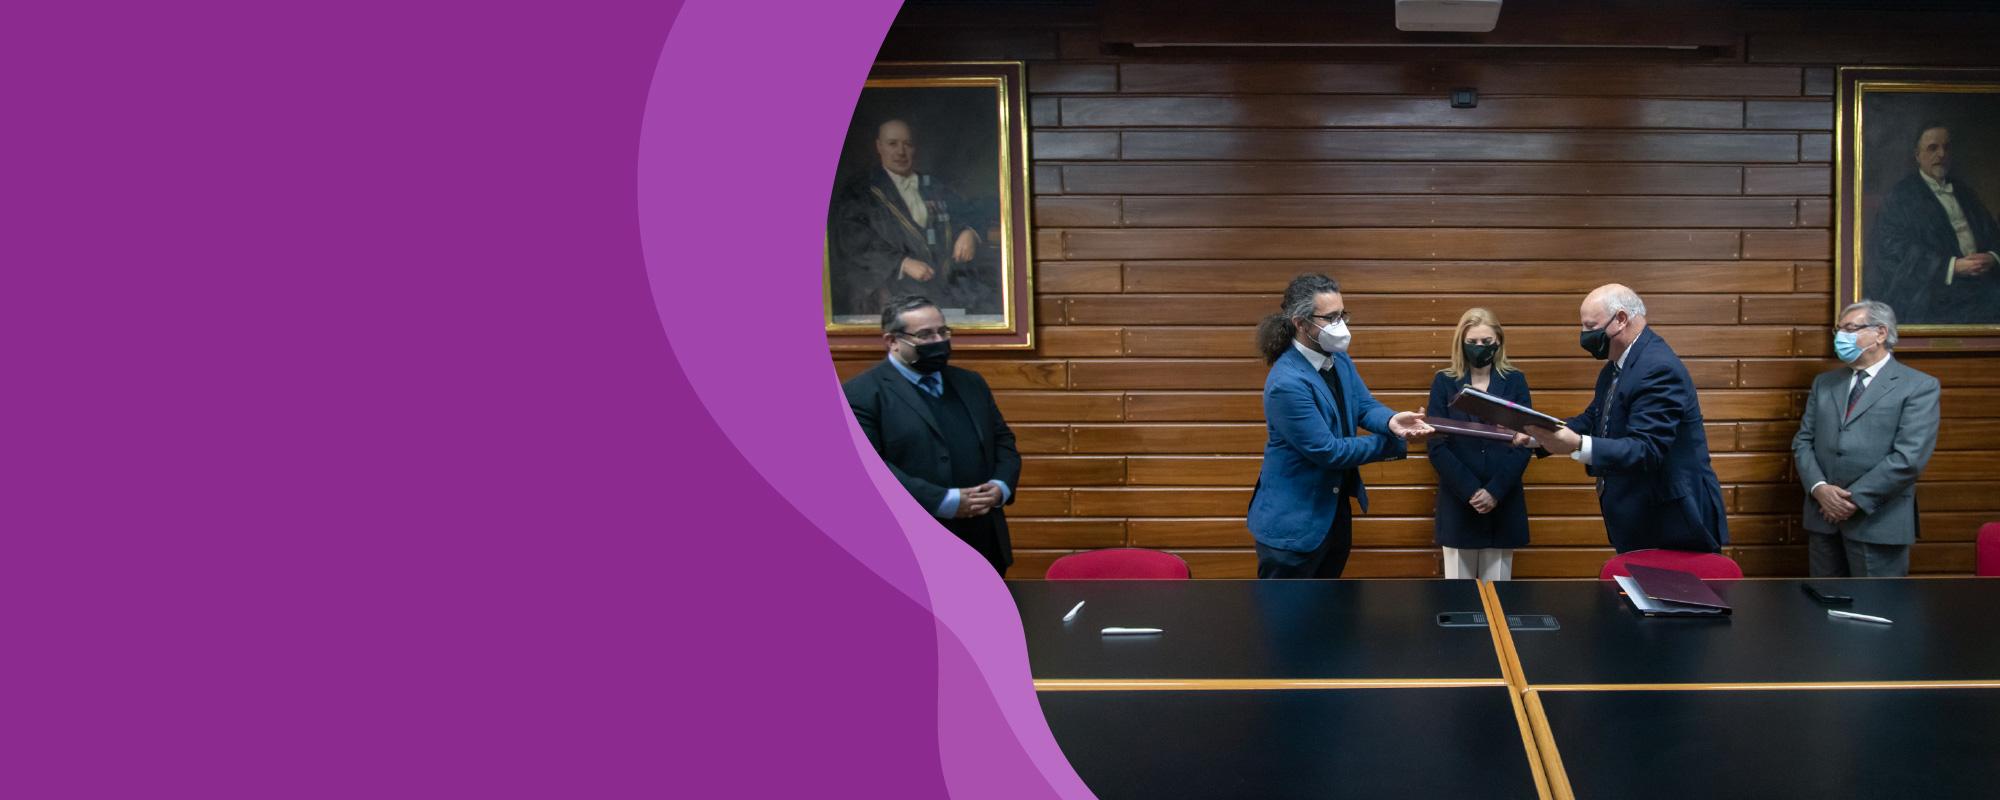 Dr Ivan Sammut, Dr JP. Baldacchino, Prof. Alfred J. Vella, Perit Karmenu Vella in Council Room